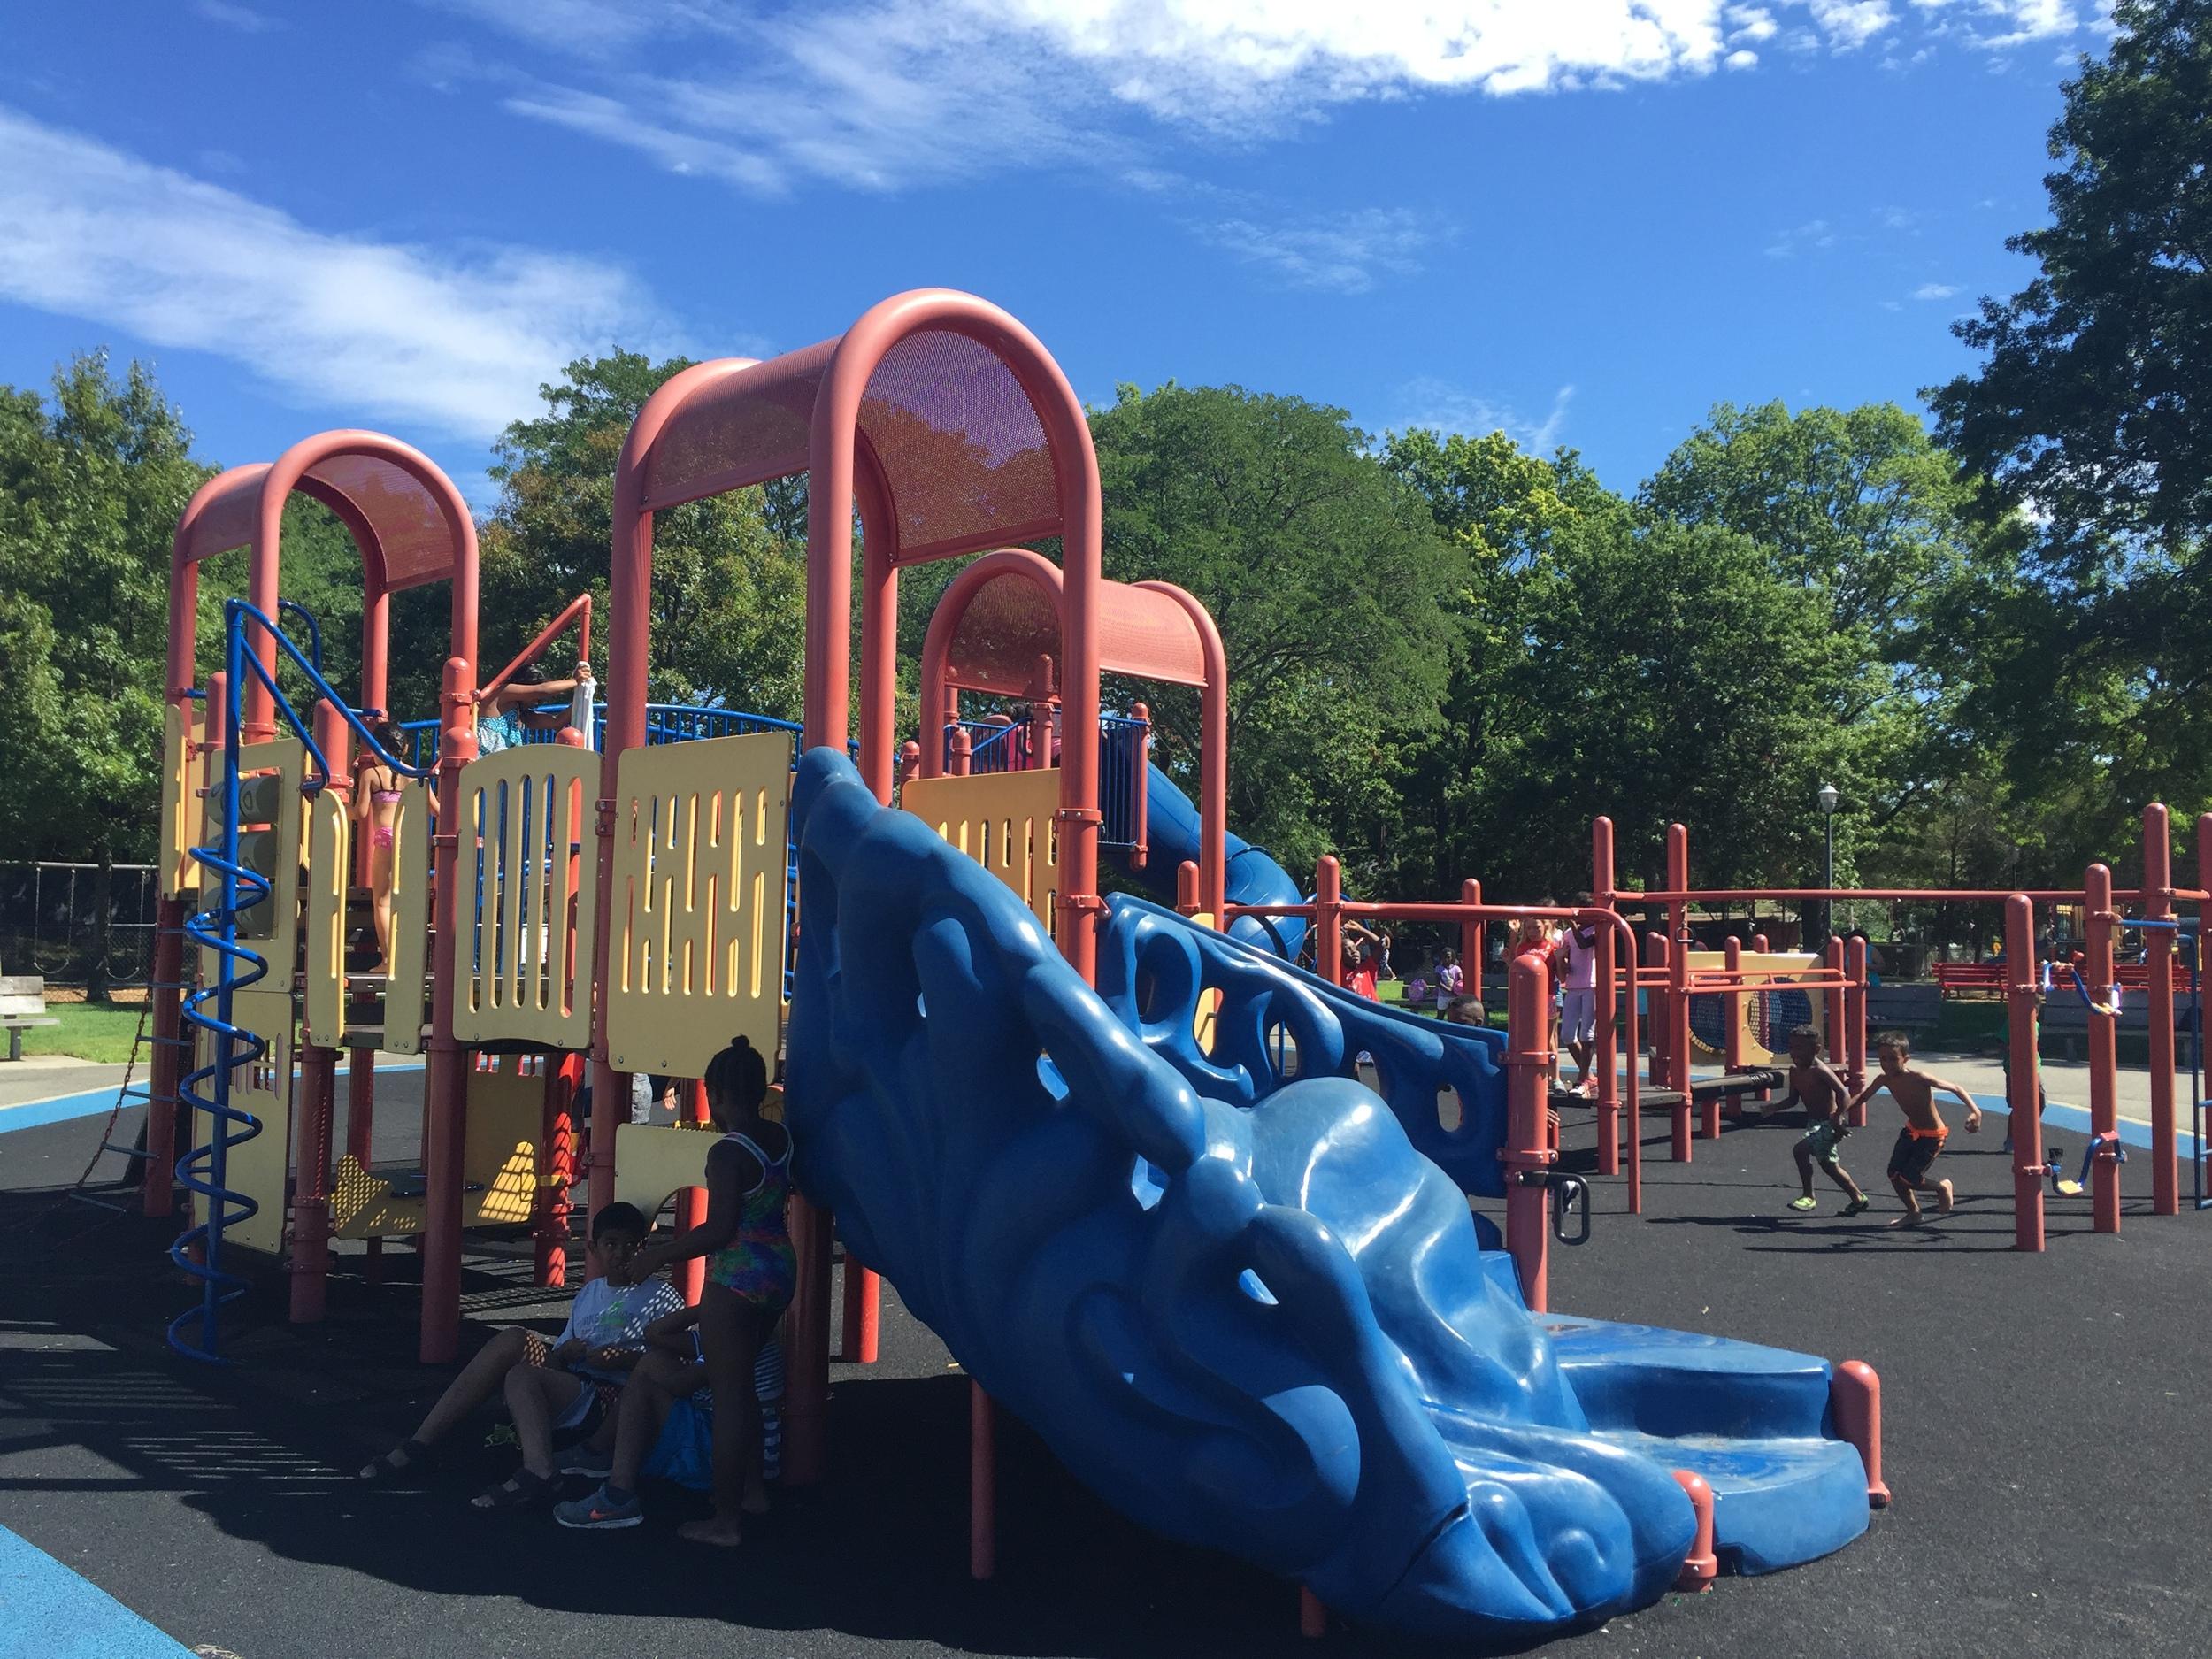 Playground at Coes Neck Park